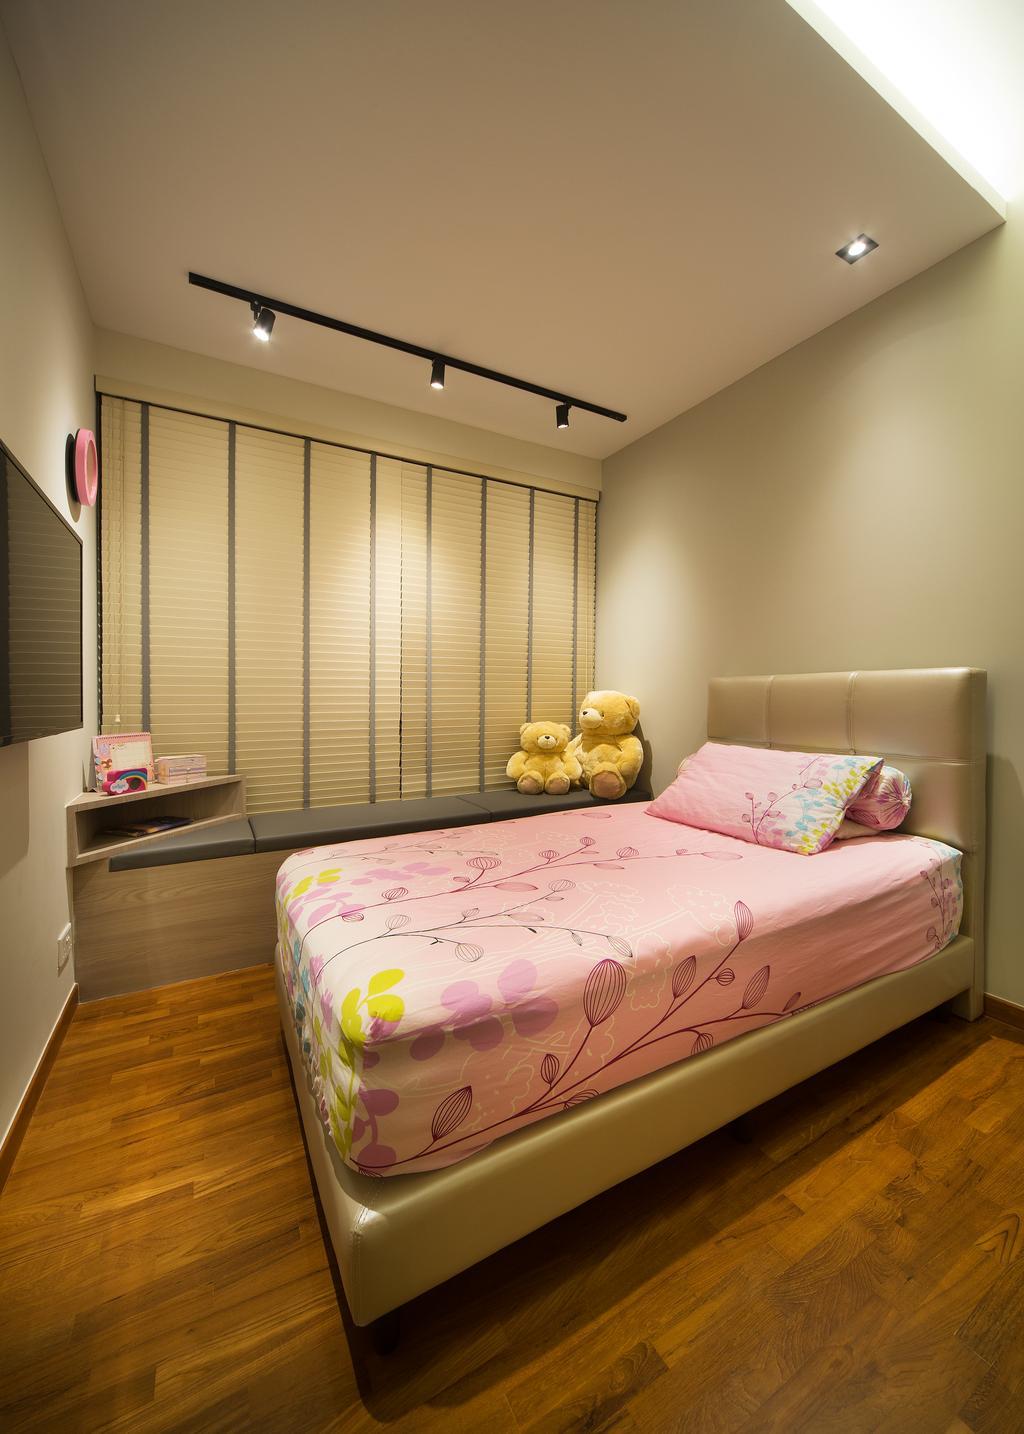 Transitional, Condo, Skypark Residence, Interior Designer, Form & Space, Teddy Bear, Toy, Bed, Furniture, Bedroom, Indoors, Interior Design, Room